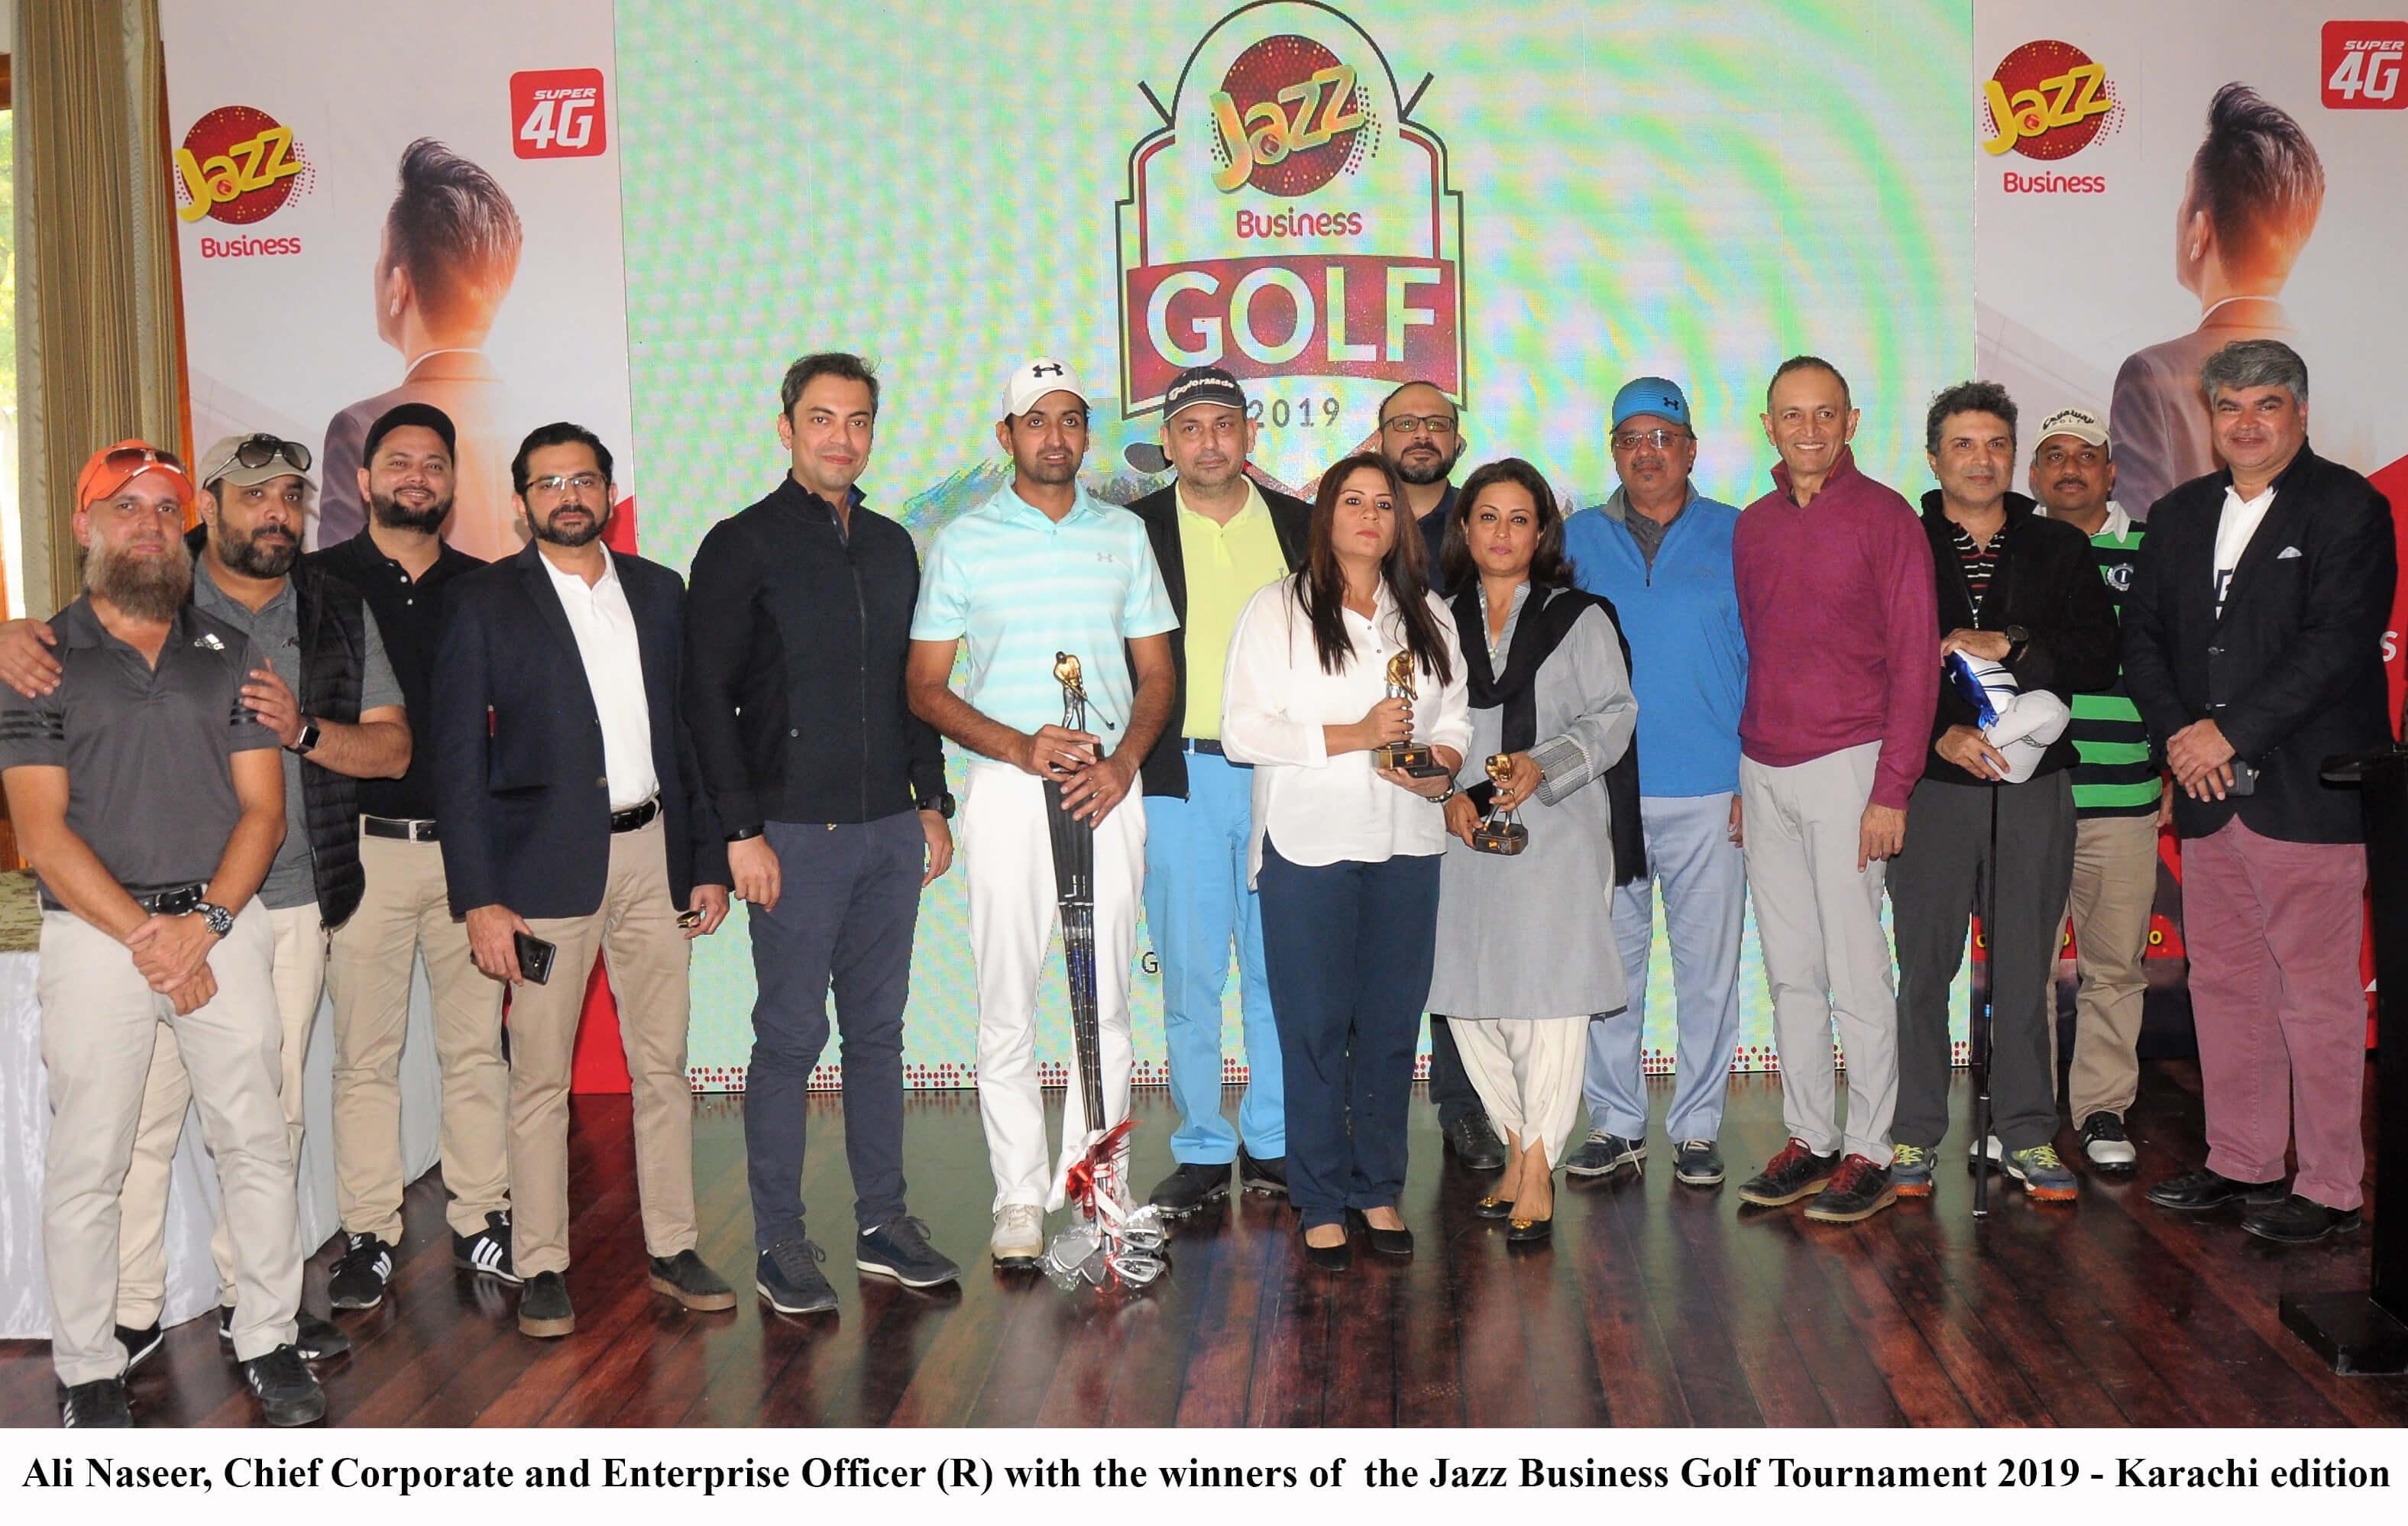 Jazz Business Golf Tournament 2019 Kicks Off in Karachi